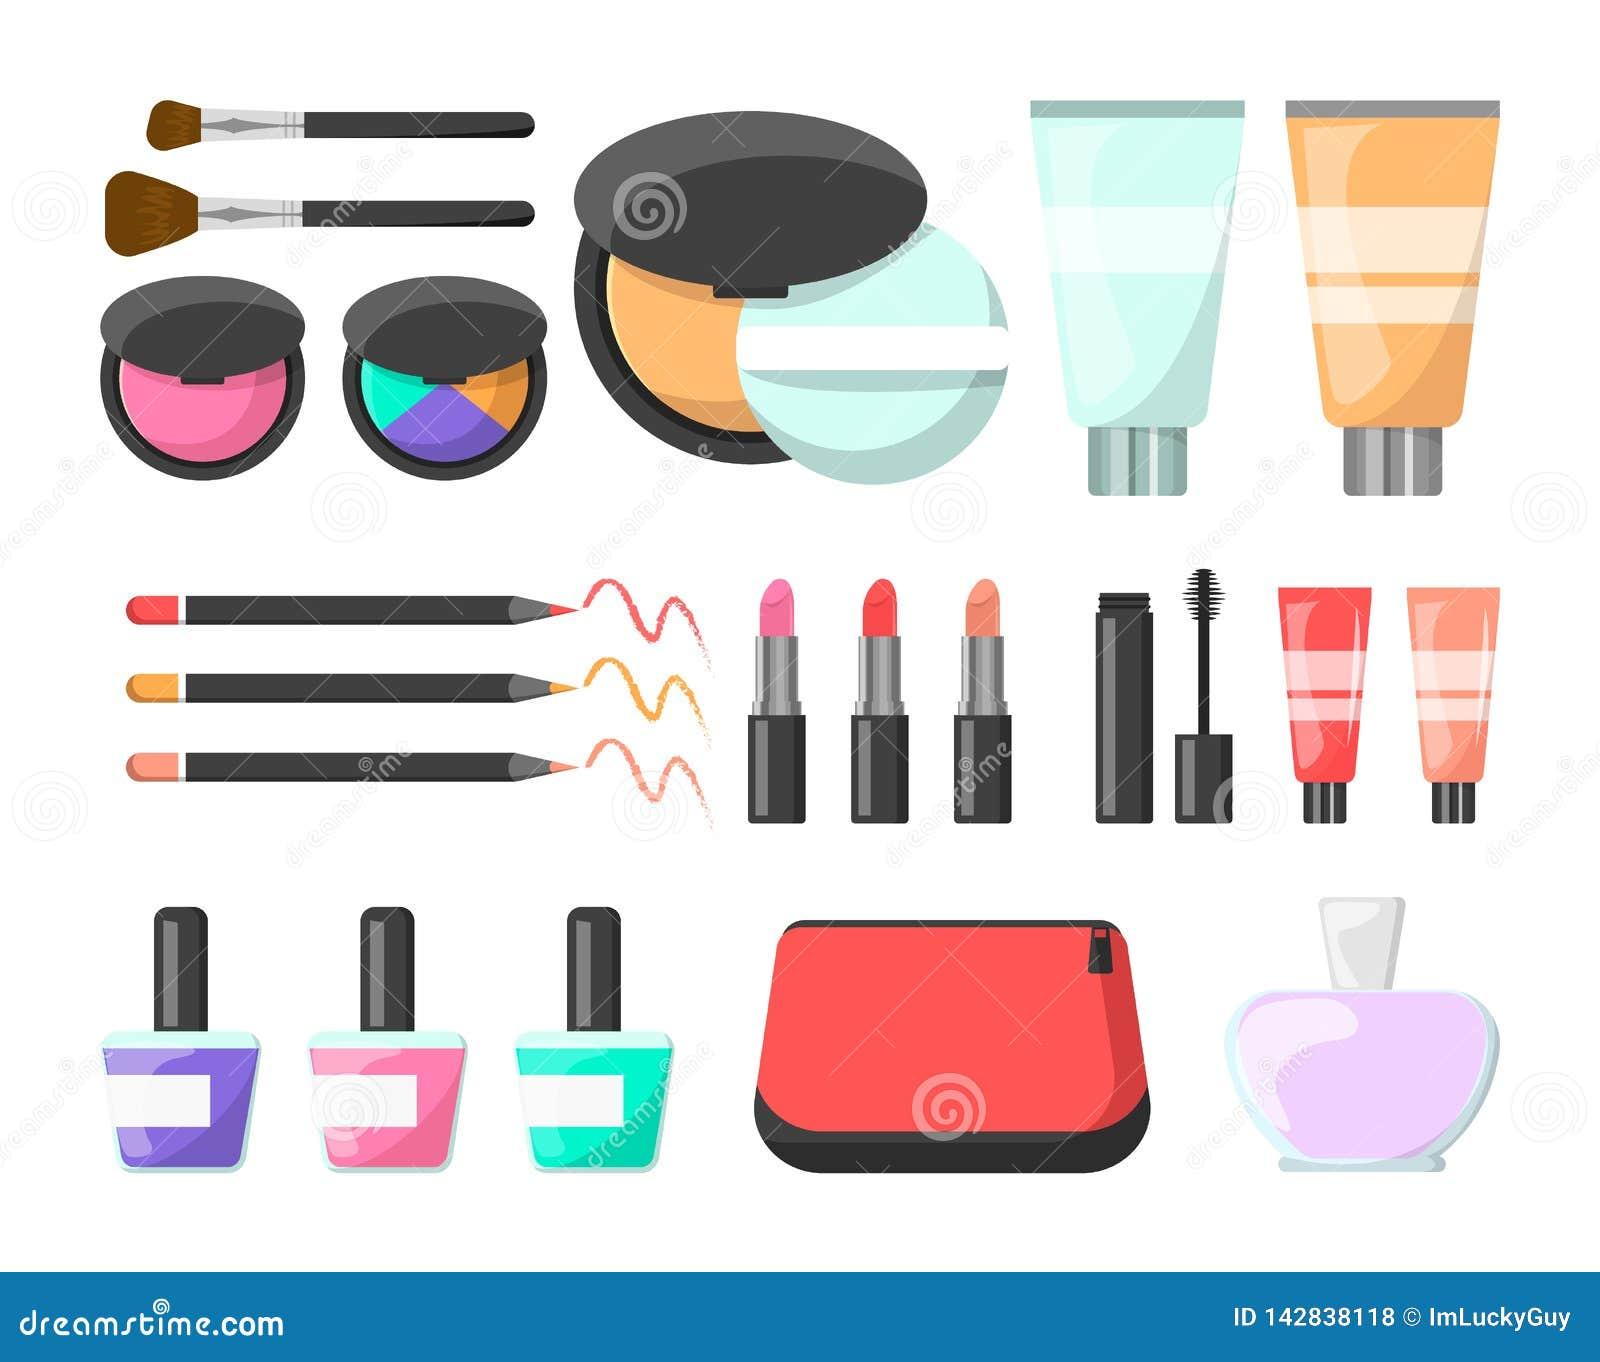 Makeup set. Cream, cosmetics brush, mascara and perfume